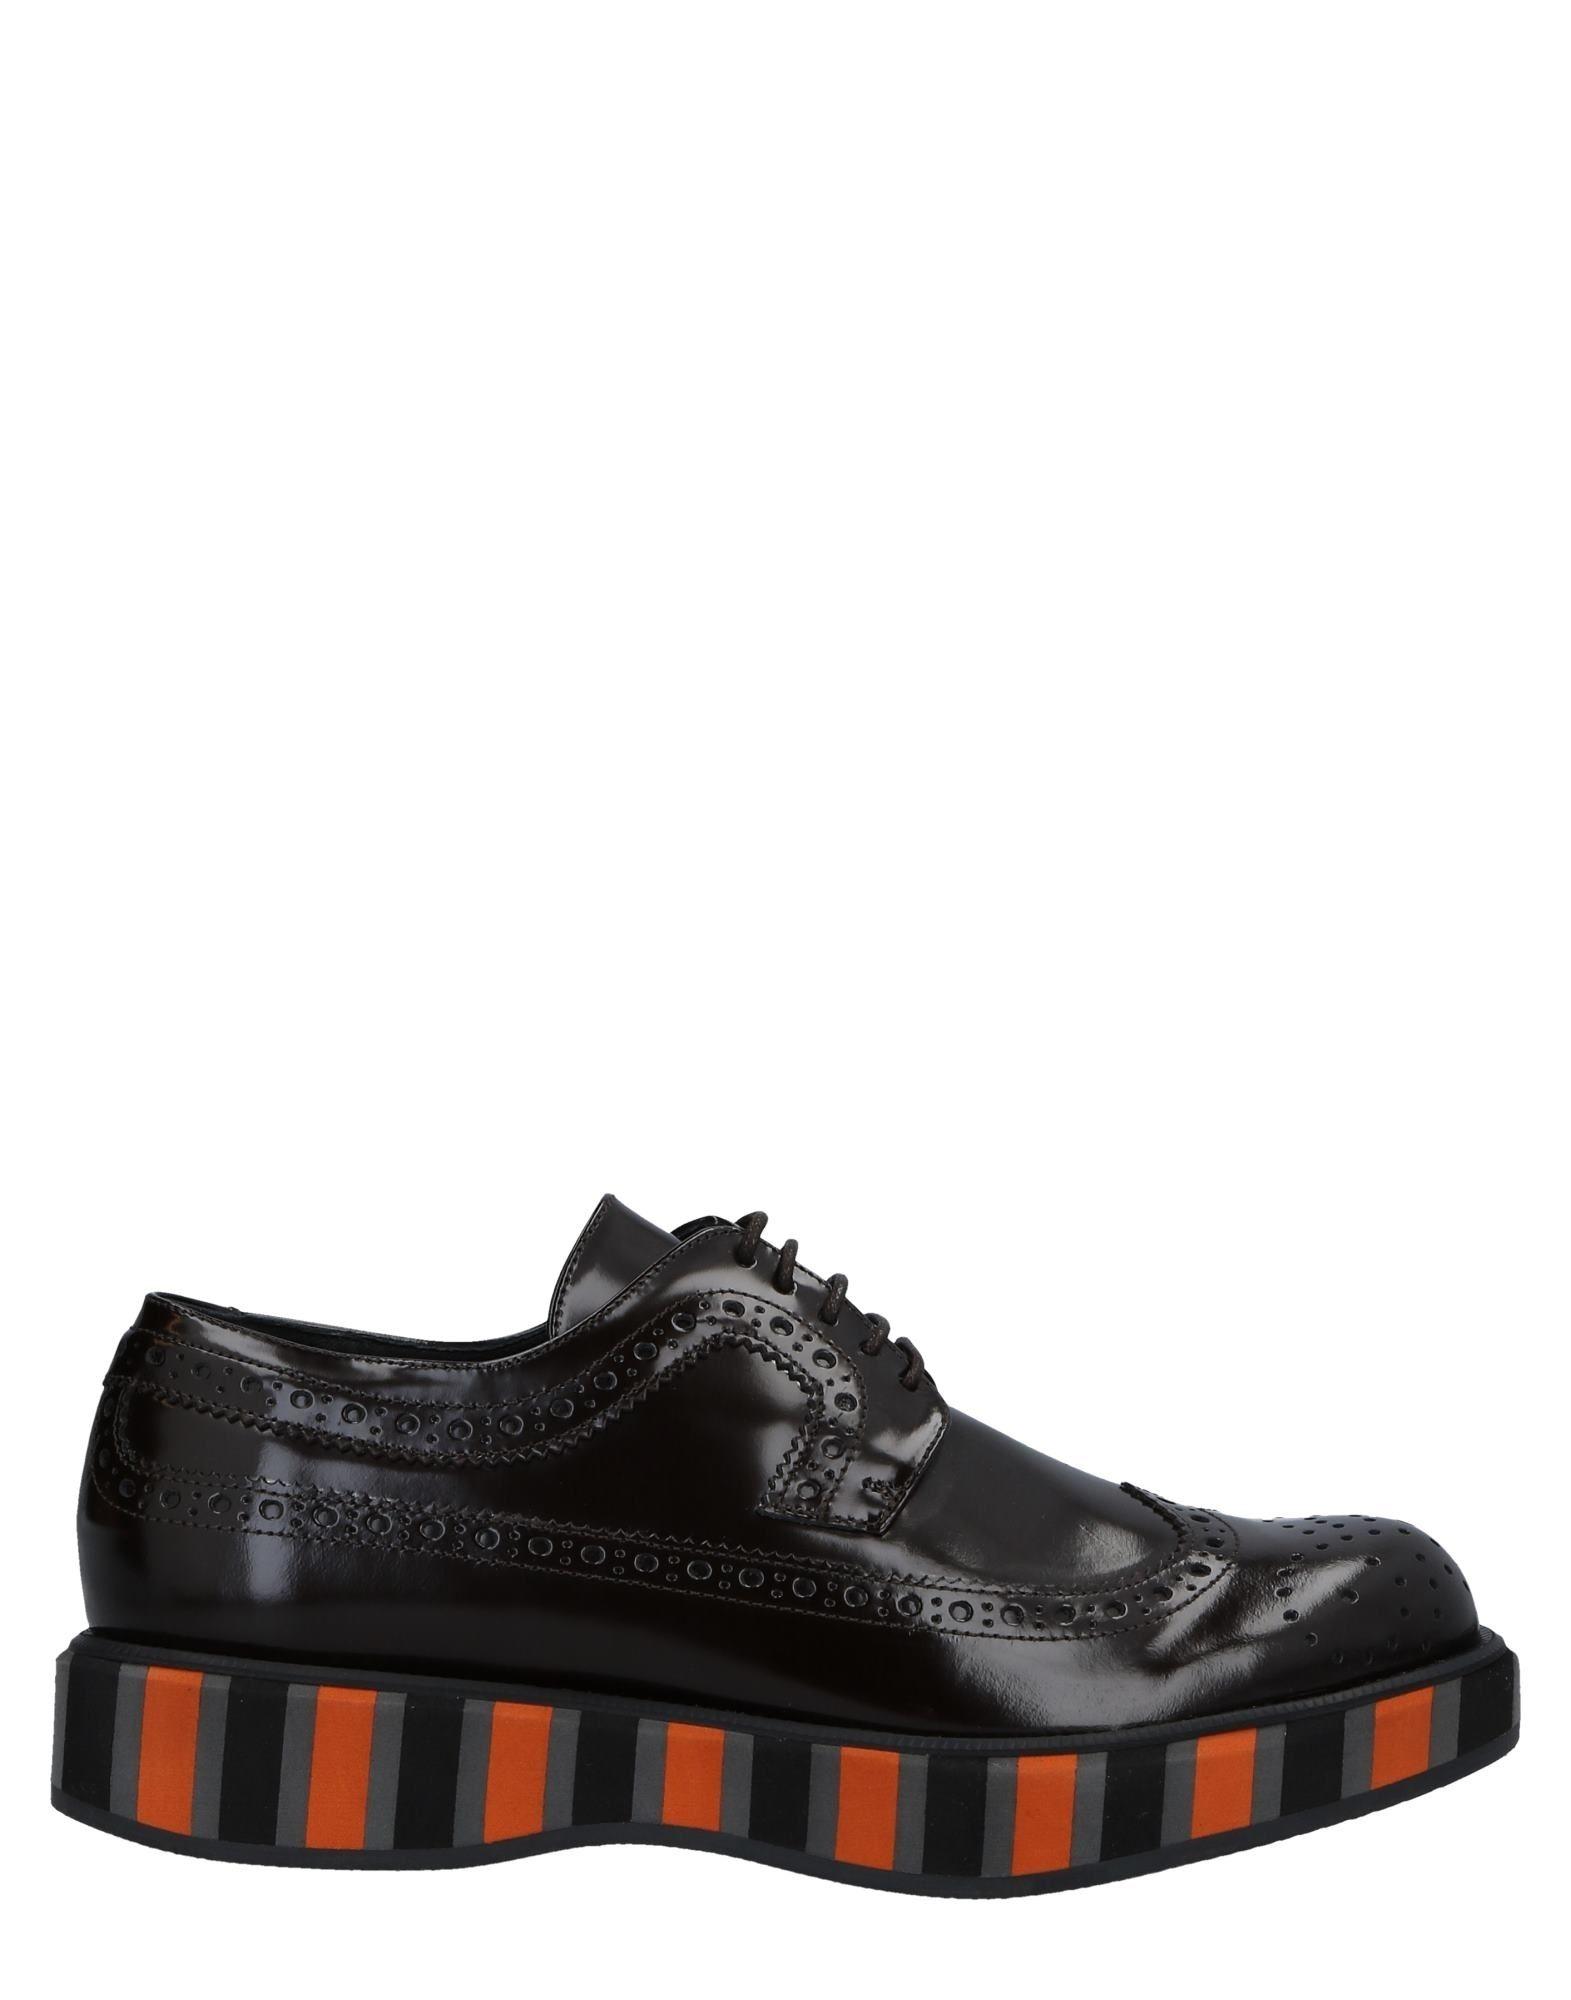 Stilvolle billige Schuhe Paloma Barceló Schnürschuhe Damen  11512954PQ